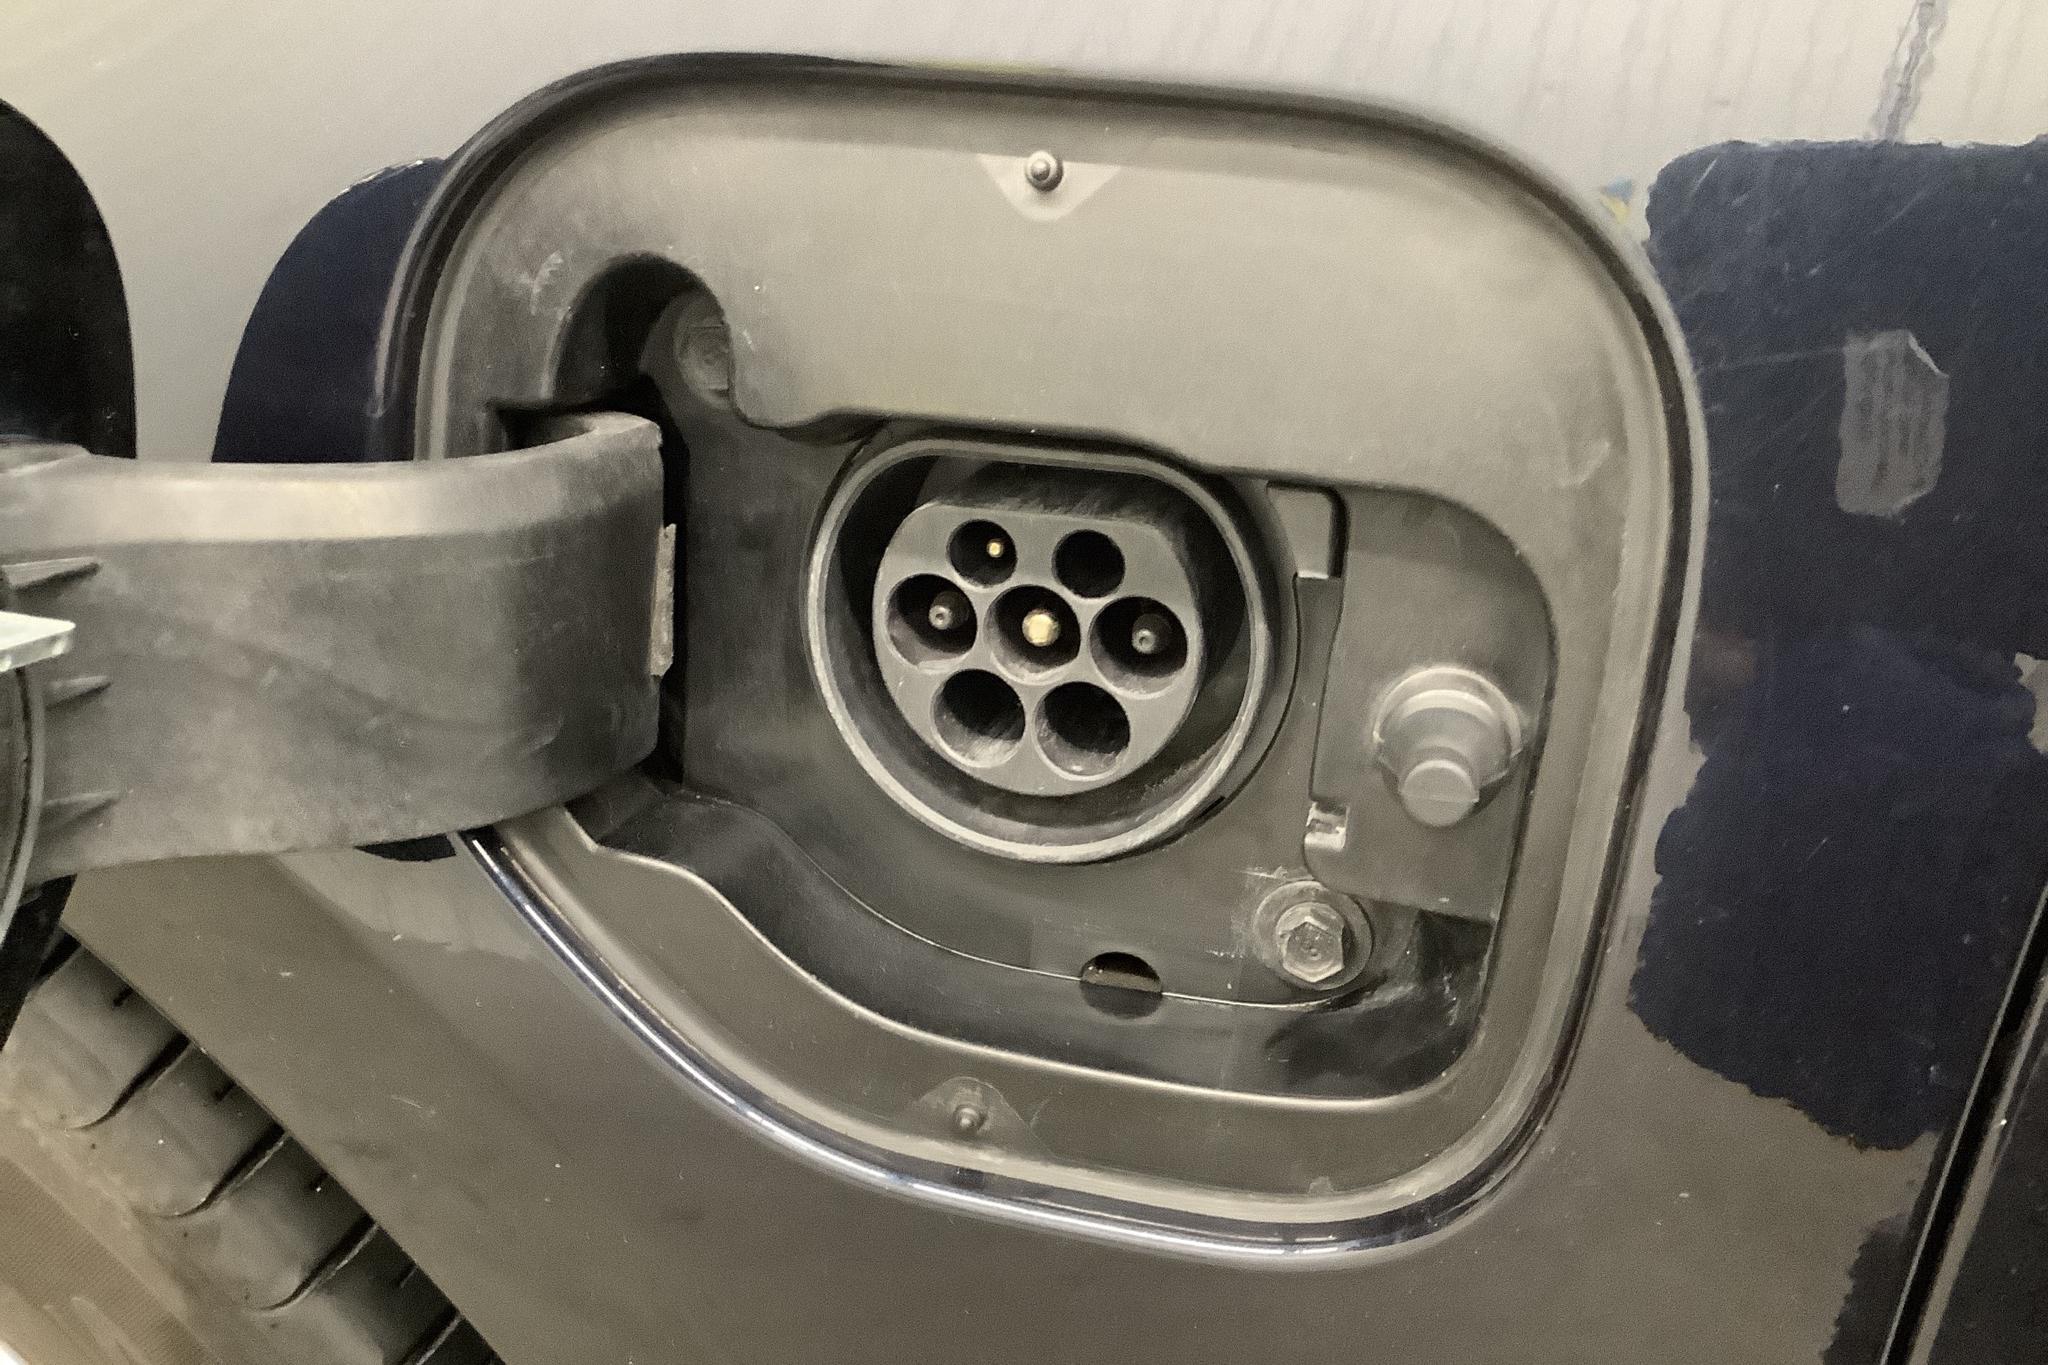 KIA Optima 2.0 GDi Plug-in Hybrid SW (205hk) - 7 078 mil - Automat - blå - 2018